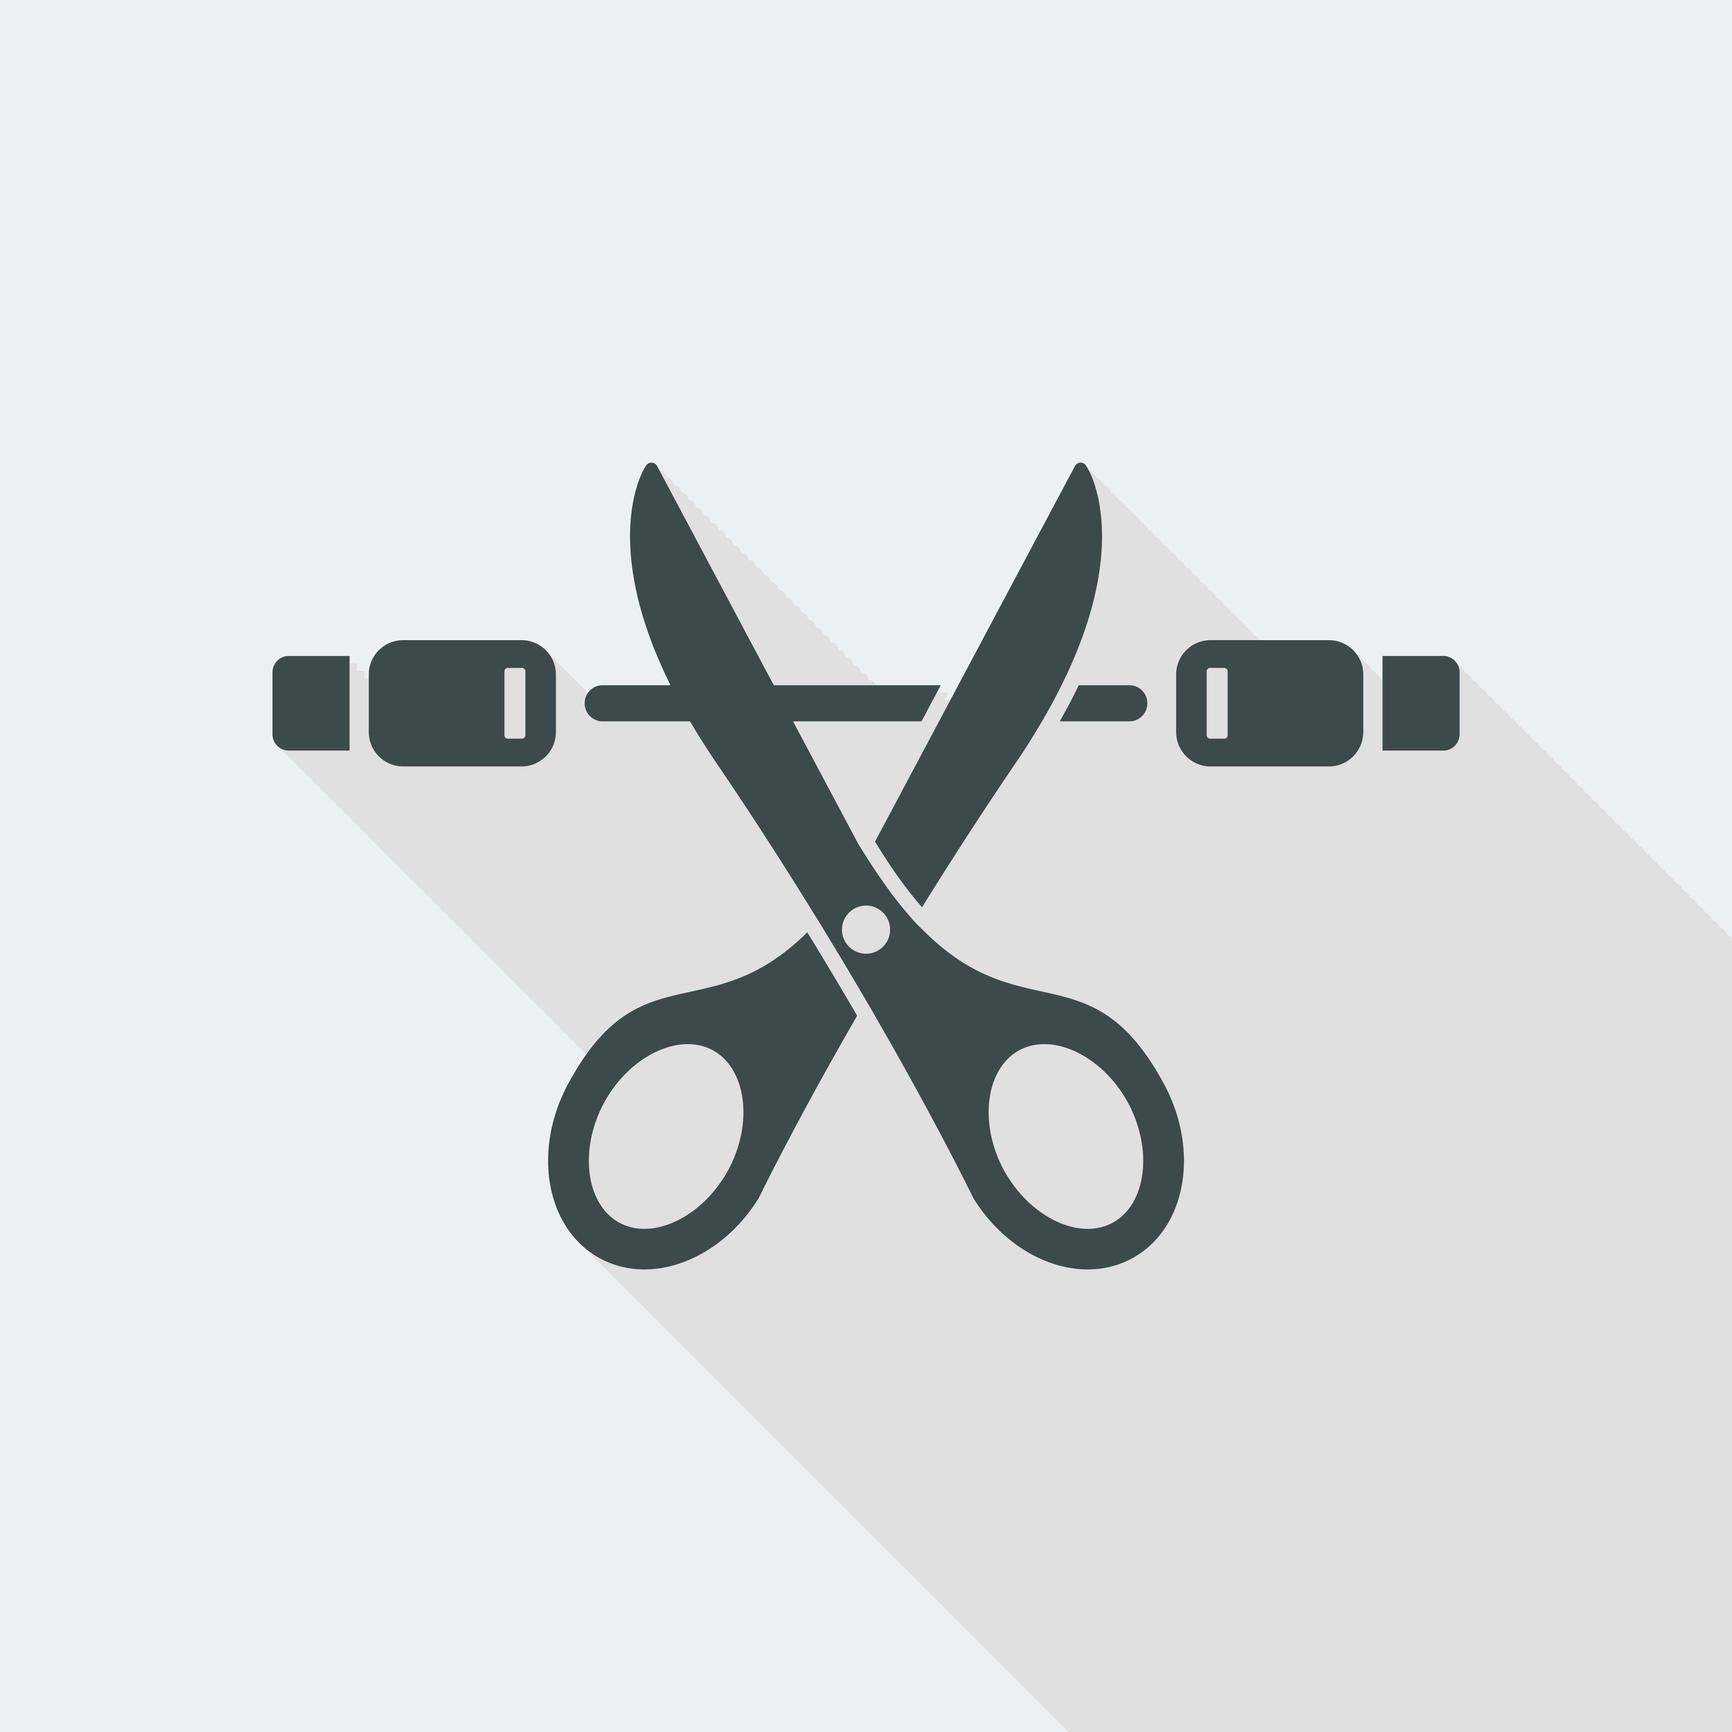 Scissor cutting a cable